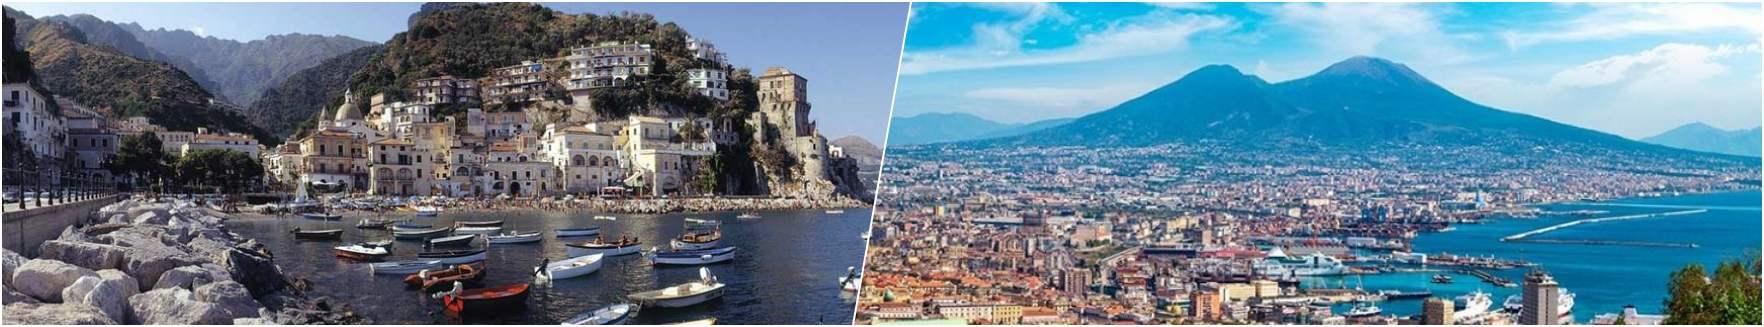 Salerno_Naples